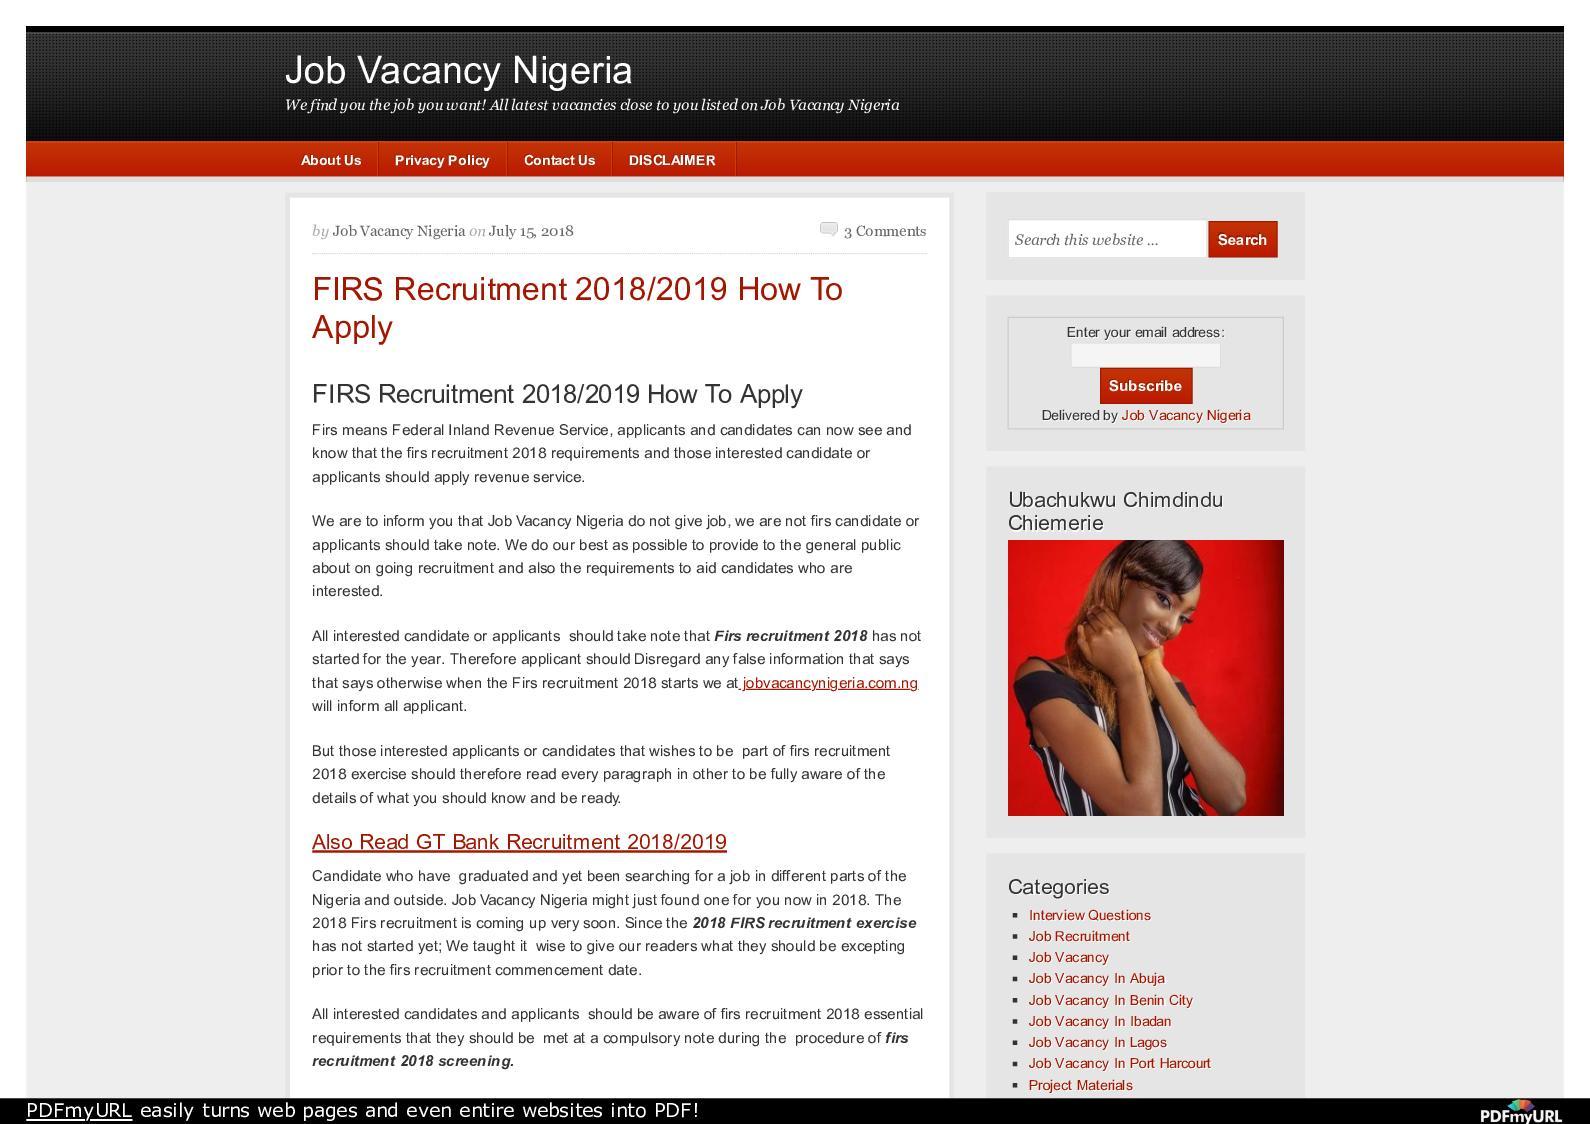 Calaméo - Www Jobvacancynigeria Com Ng Firs Recruitment 2018 2019